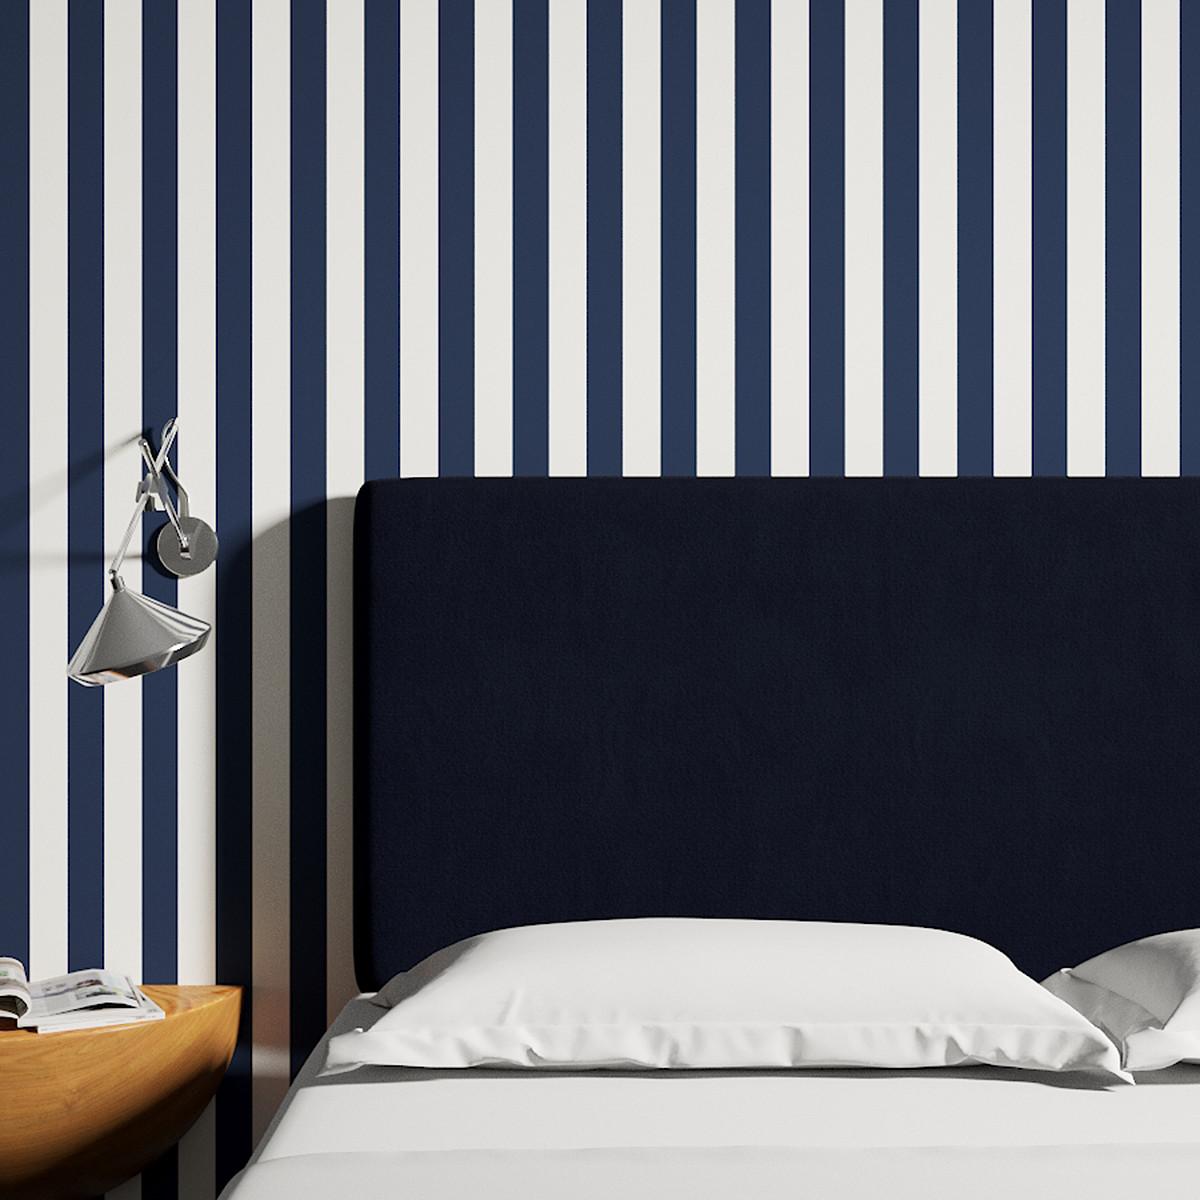 Peel And Stick Wallpaper Roll Navy Cabana Stripe